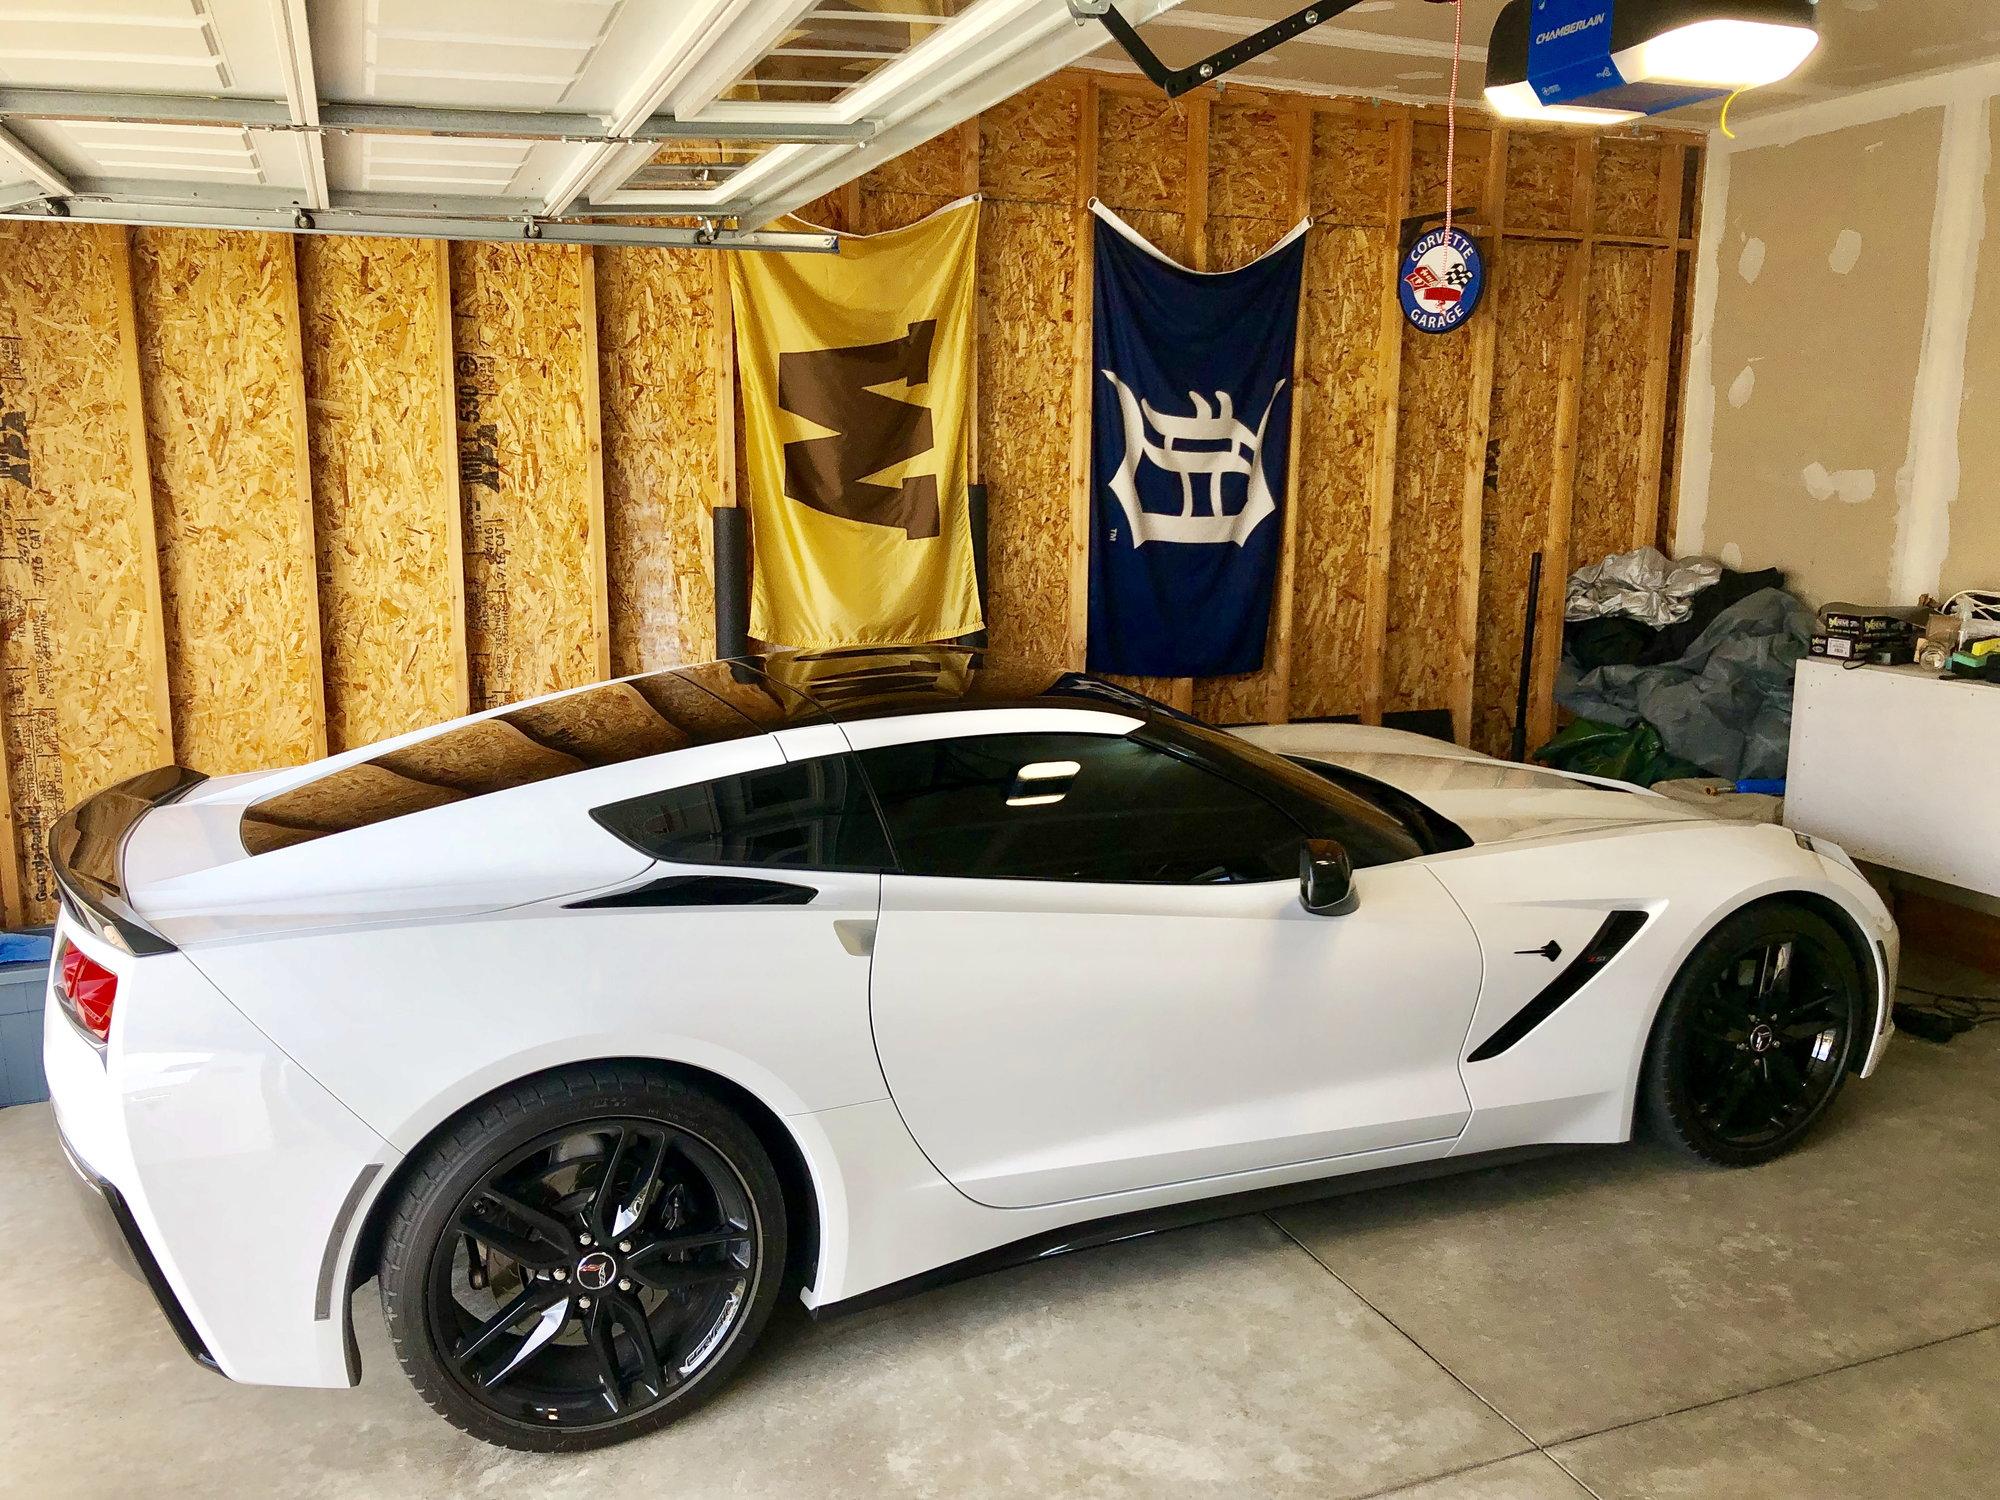 Brake Caliper Color With Black Wheels Corvetteforum Chevrolet Corvette Forum Discussion